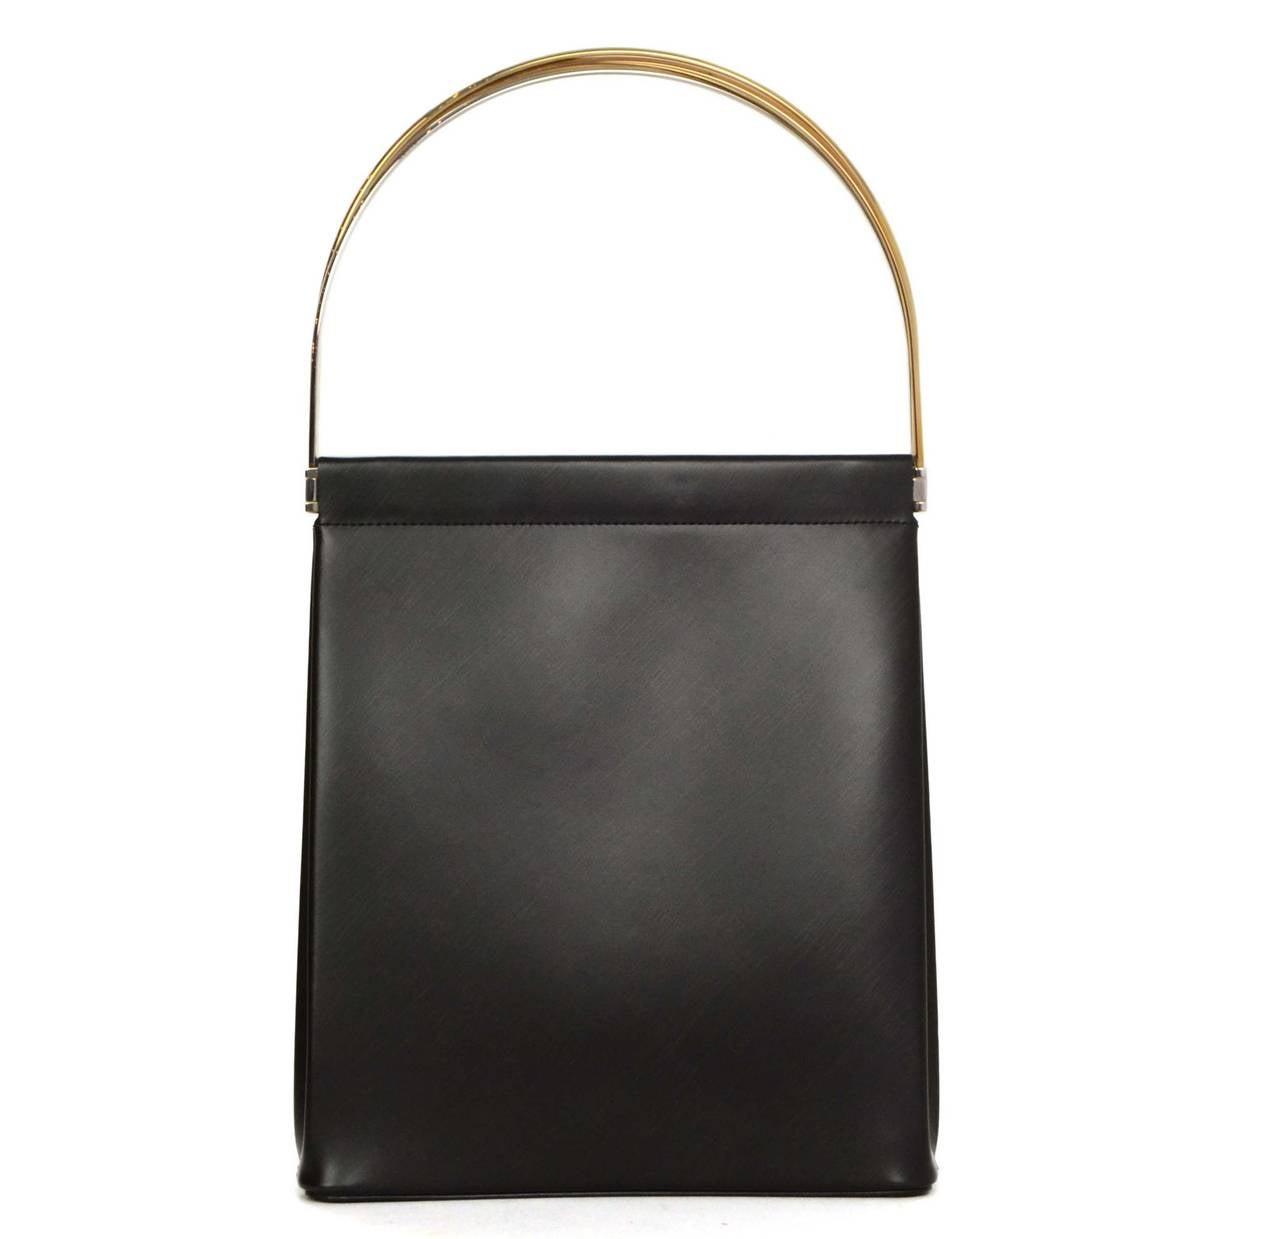 cartier black leather handle bag at 1stdibs